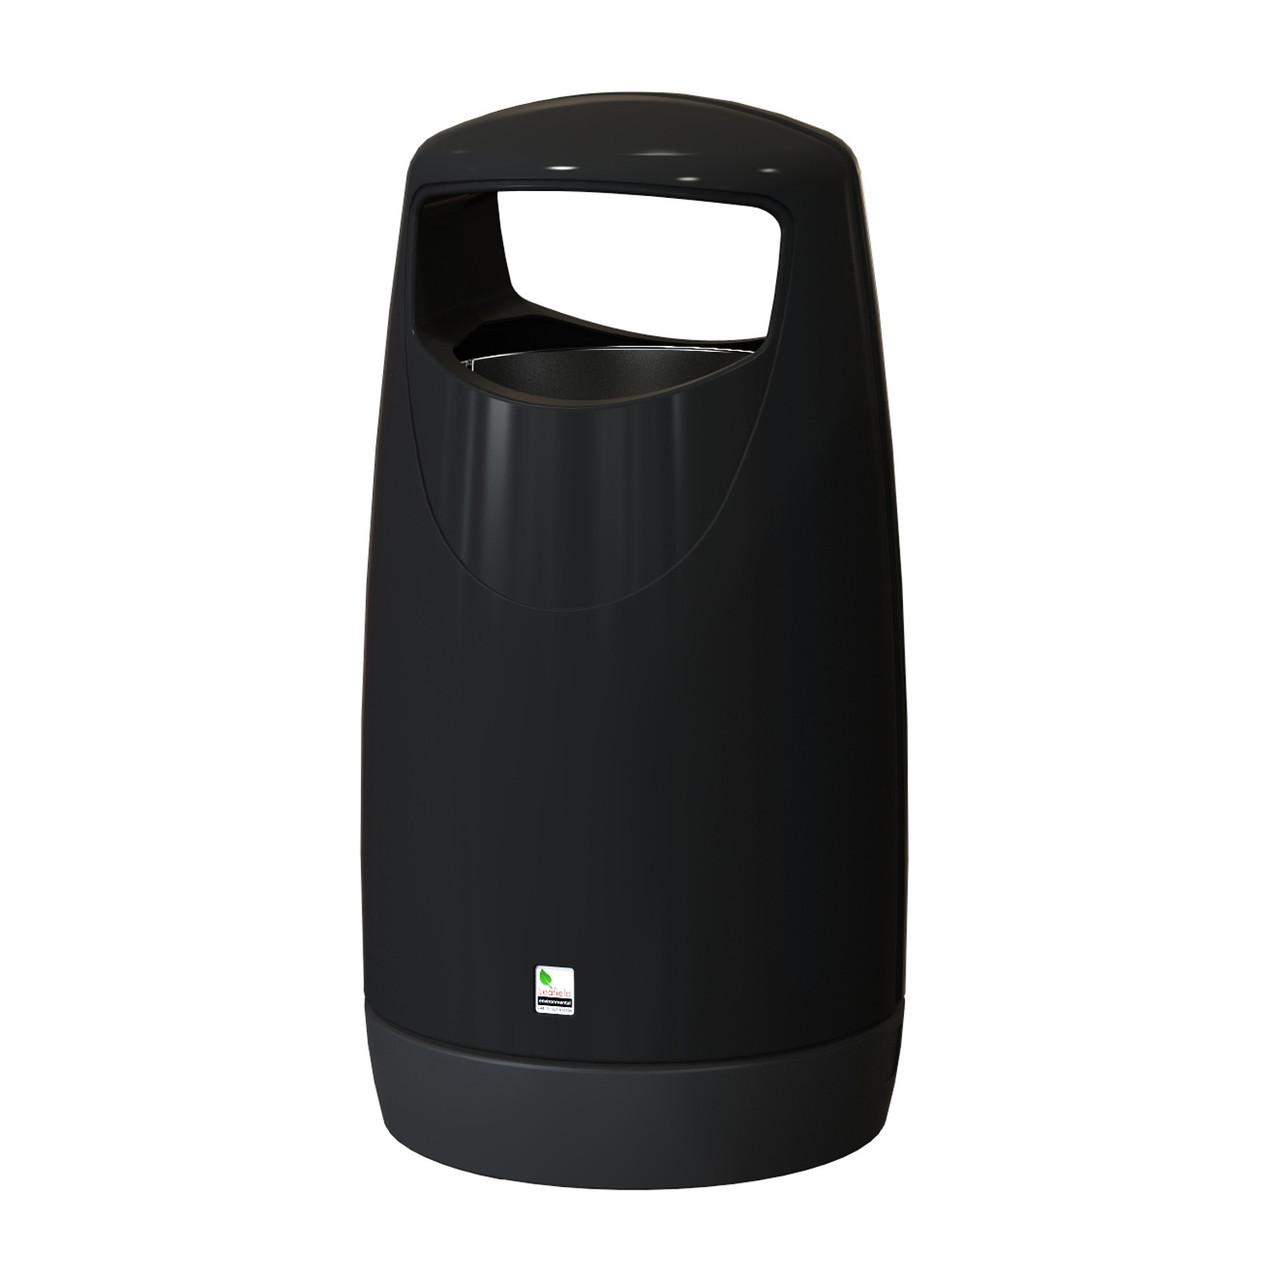 Consort litter bin 100 litre black